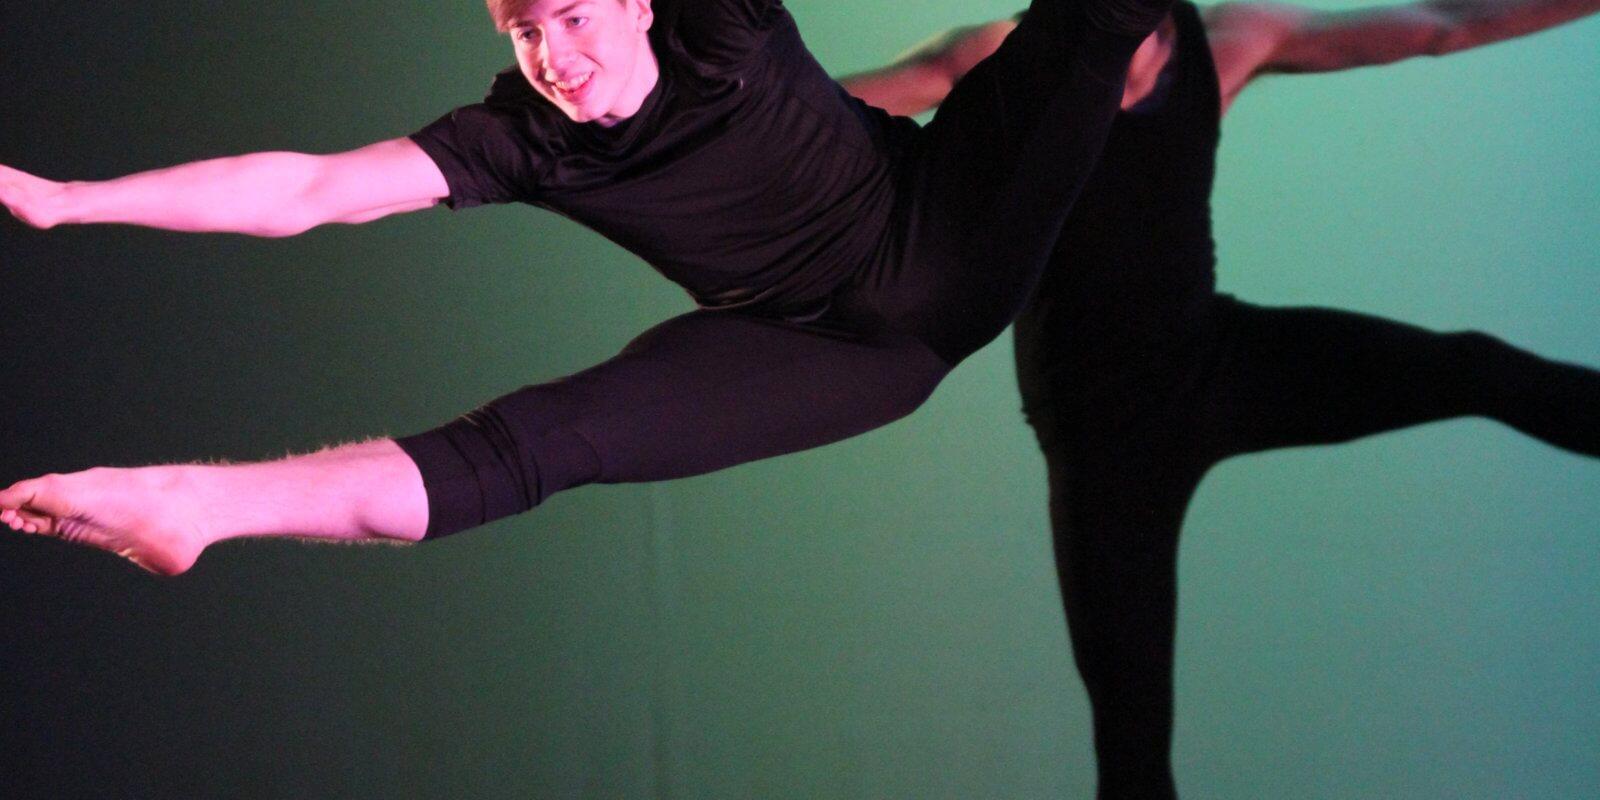 Arts1 Gallery: Dare to Dance 'RAD Centenary Celebration' 5